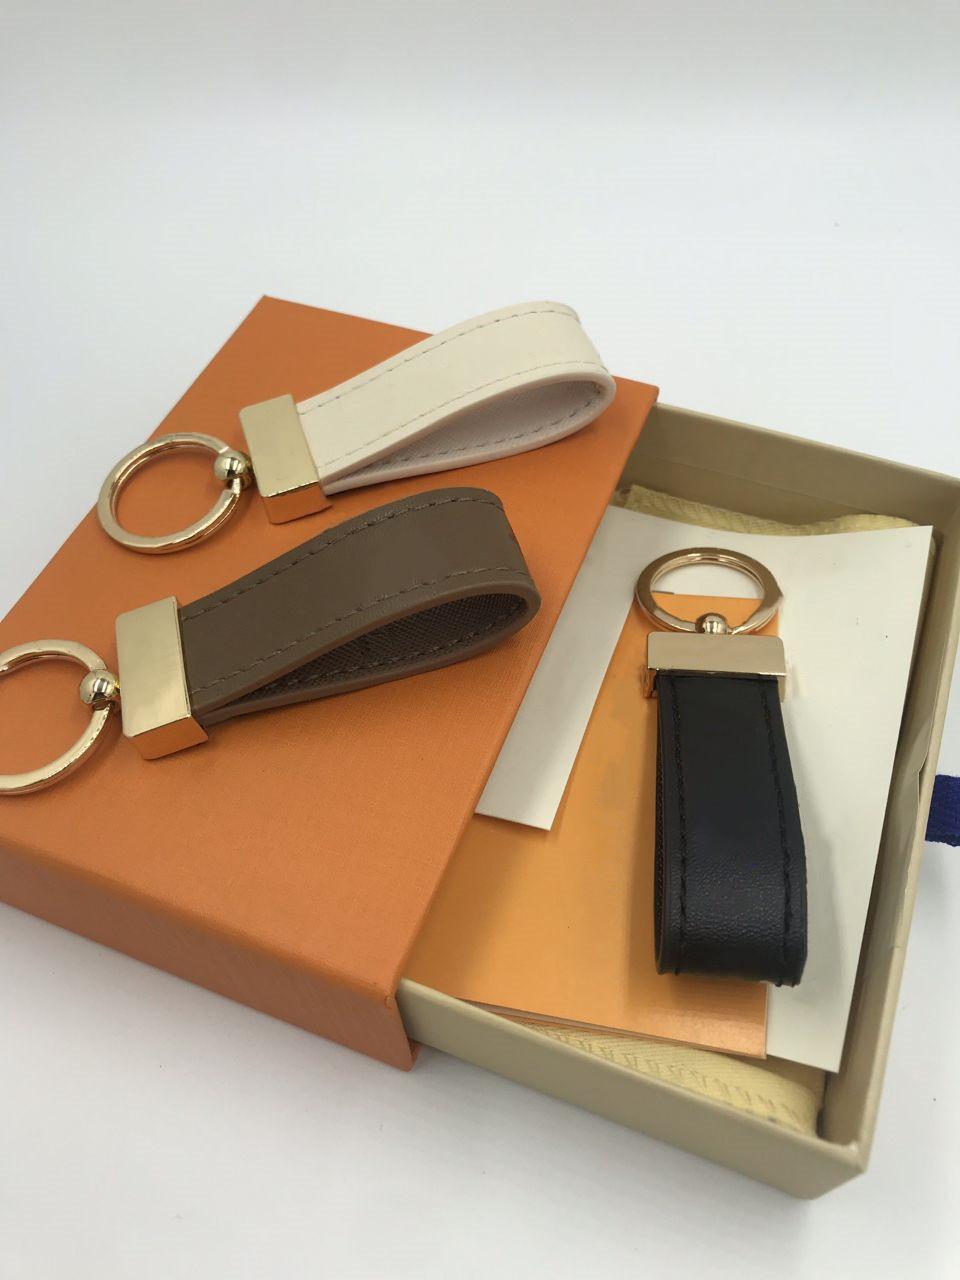 Fashion Key Buckle Car Keychain Handmade Leather Keychains Men Women Bag Pendant Accessories 9 Color